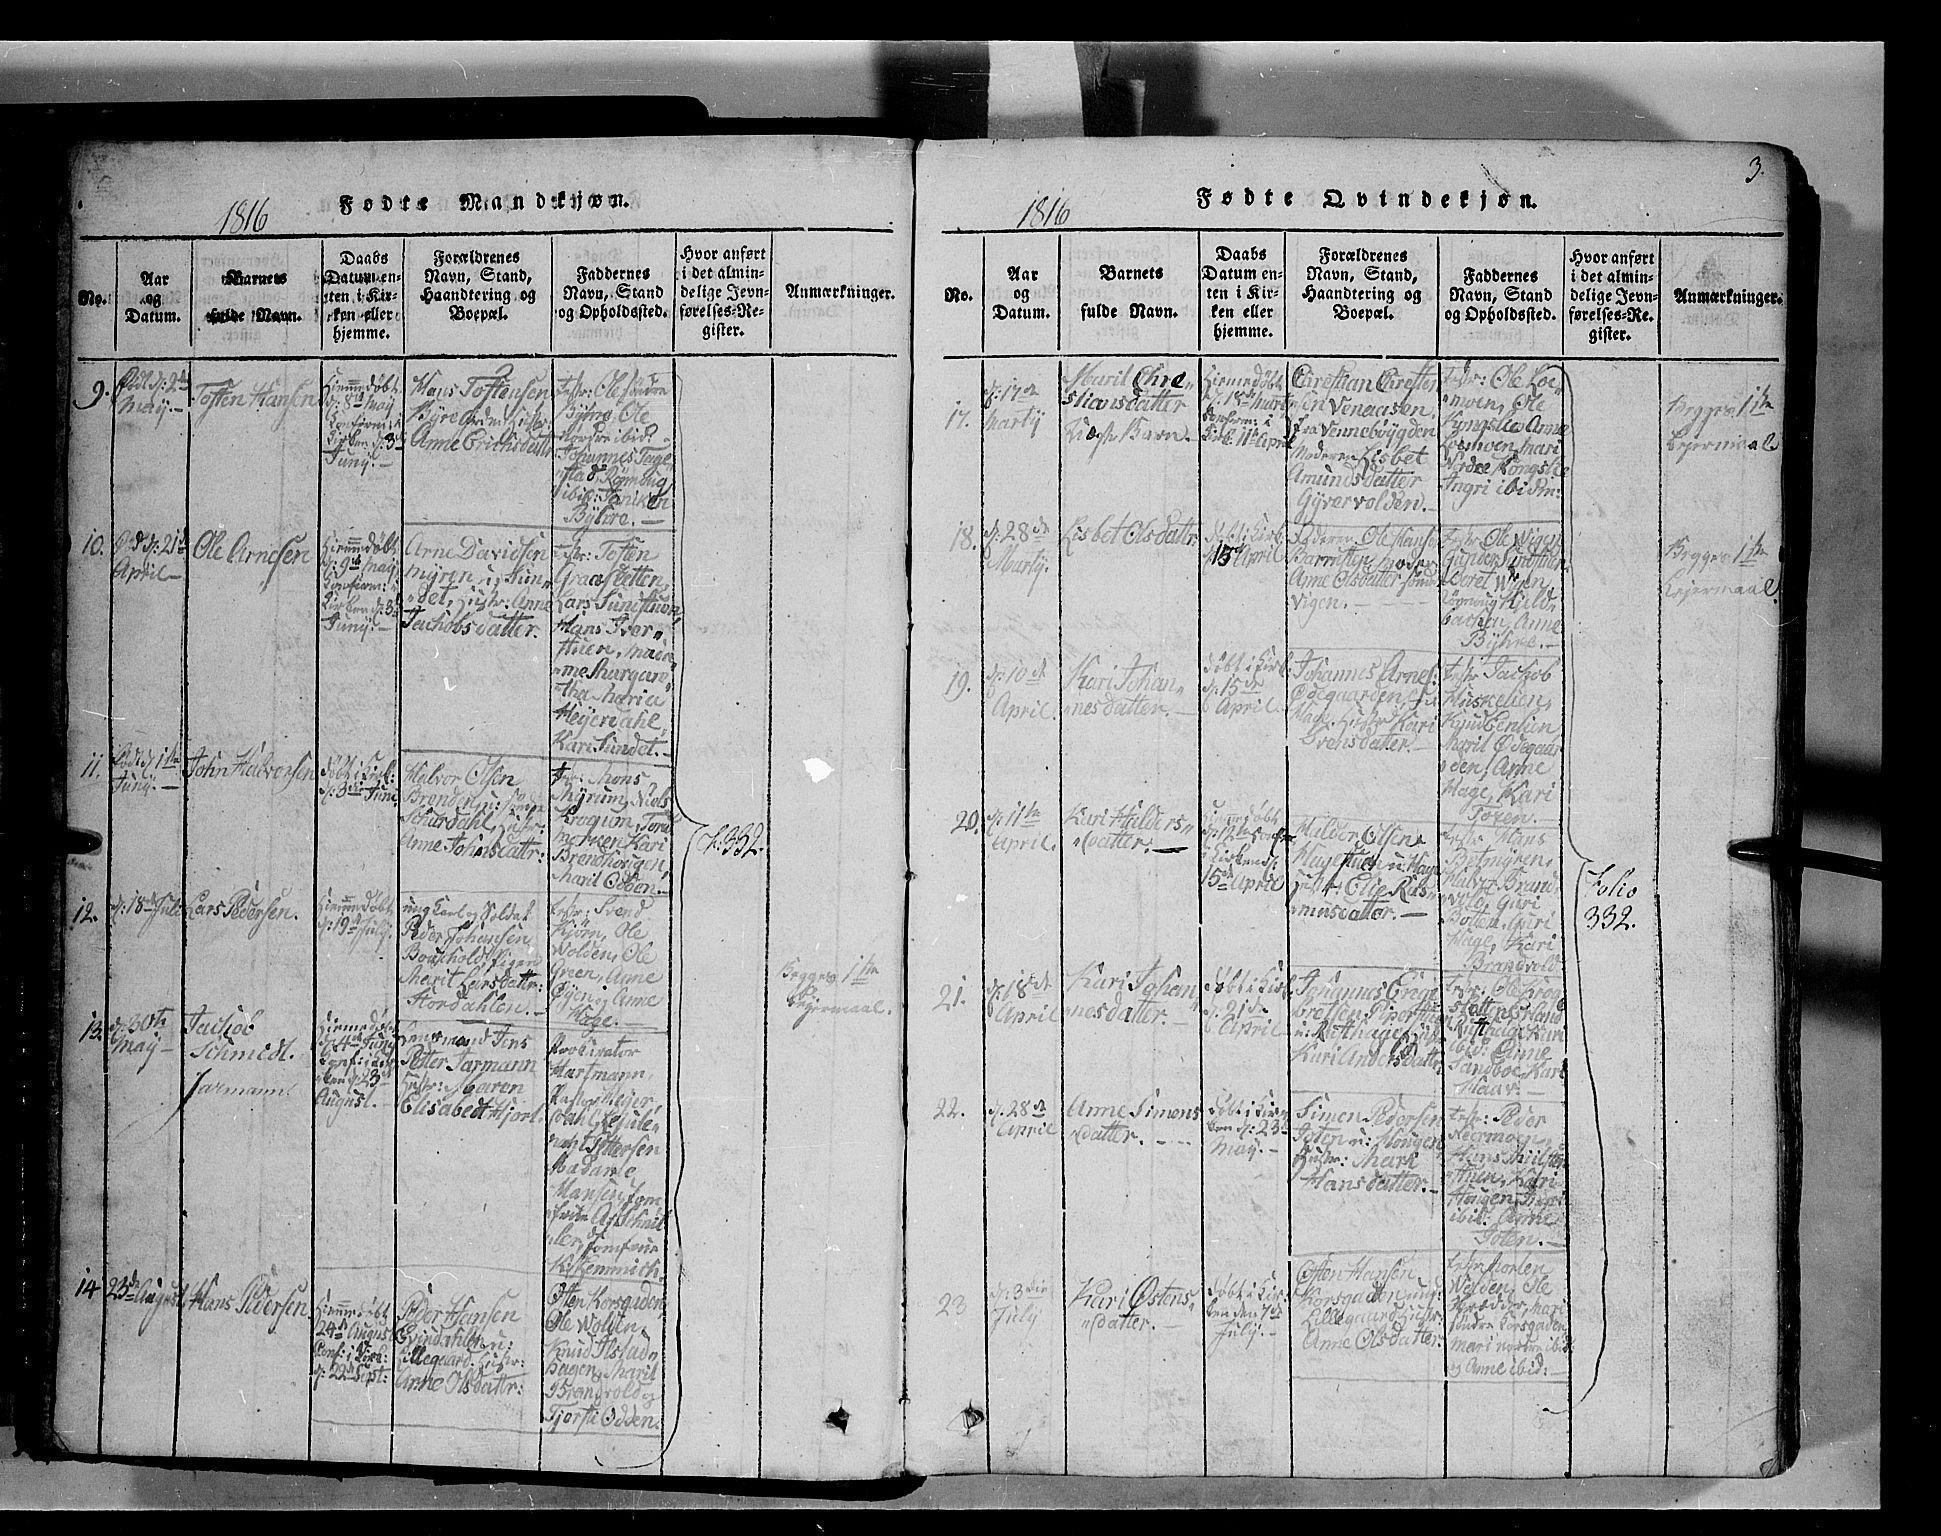 SAH, Fron prestekontor, H/Ha/Hab/L0004: Klokkerbok nr. 4, 1816-1850, s. 3